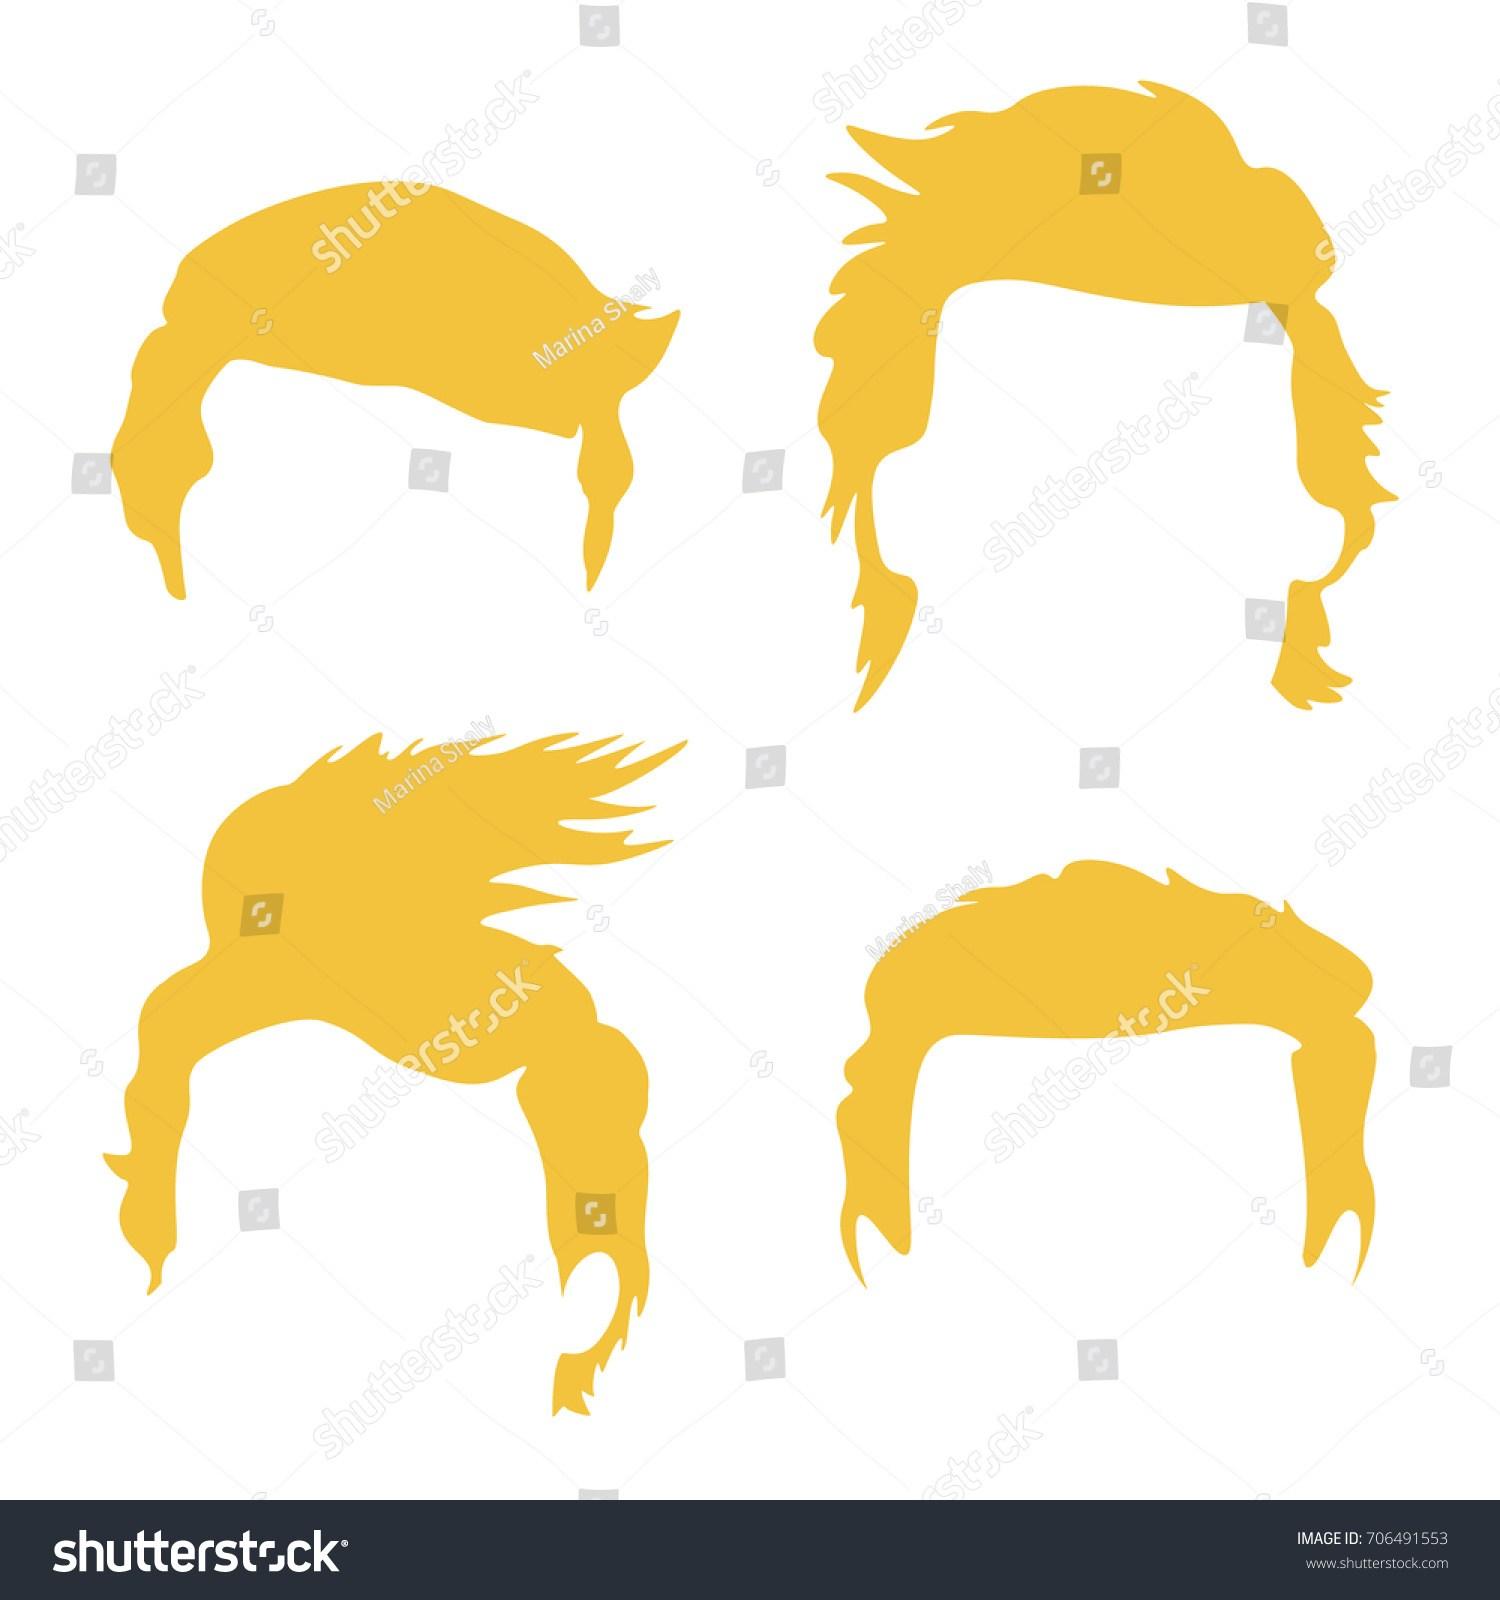 Donald trump hair clipart 4 » Clipart Portal.